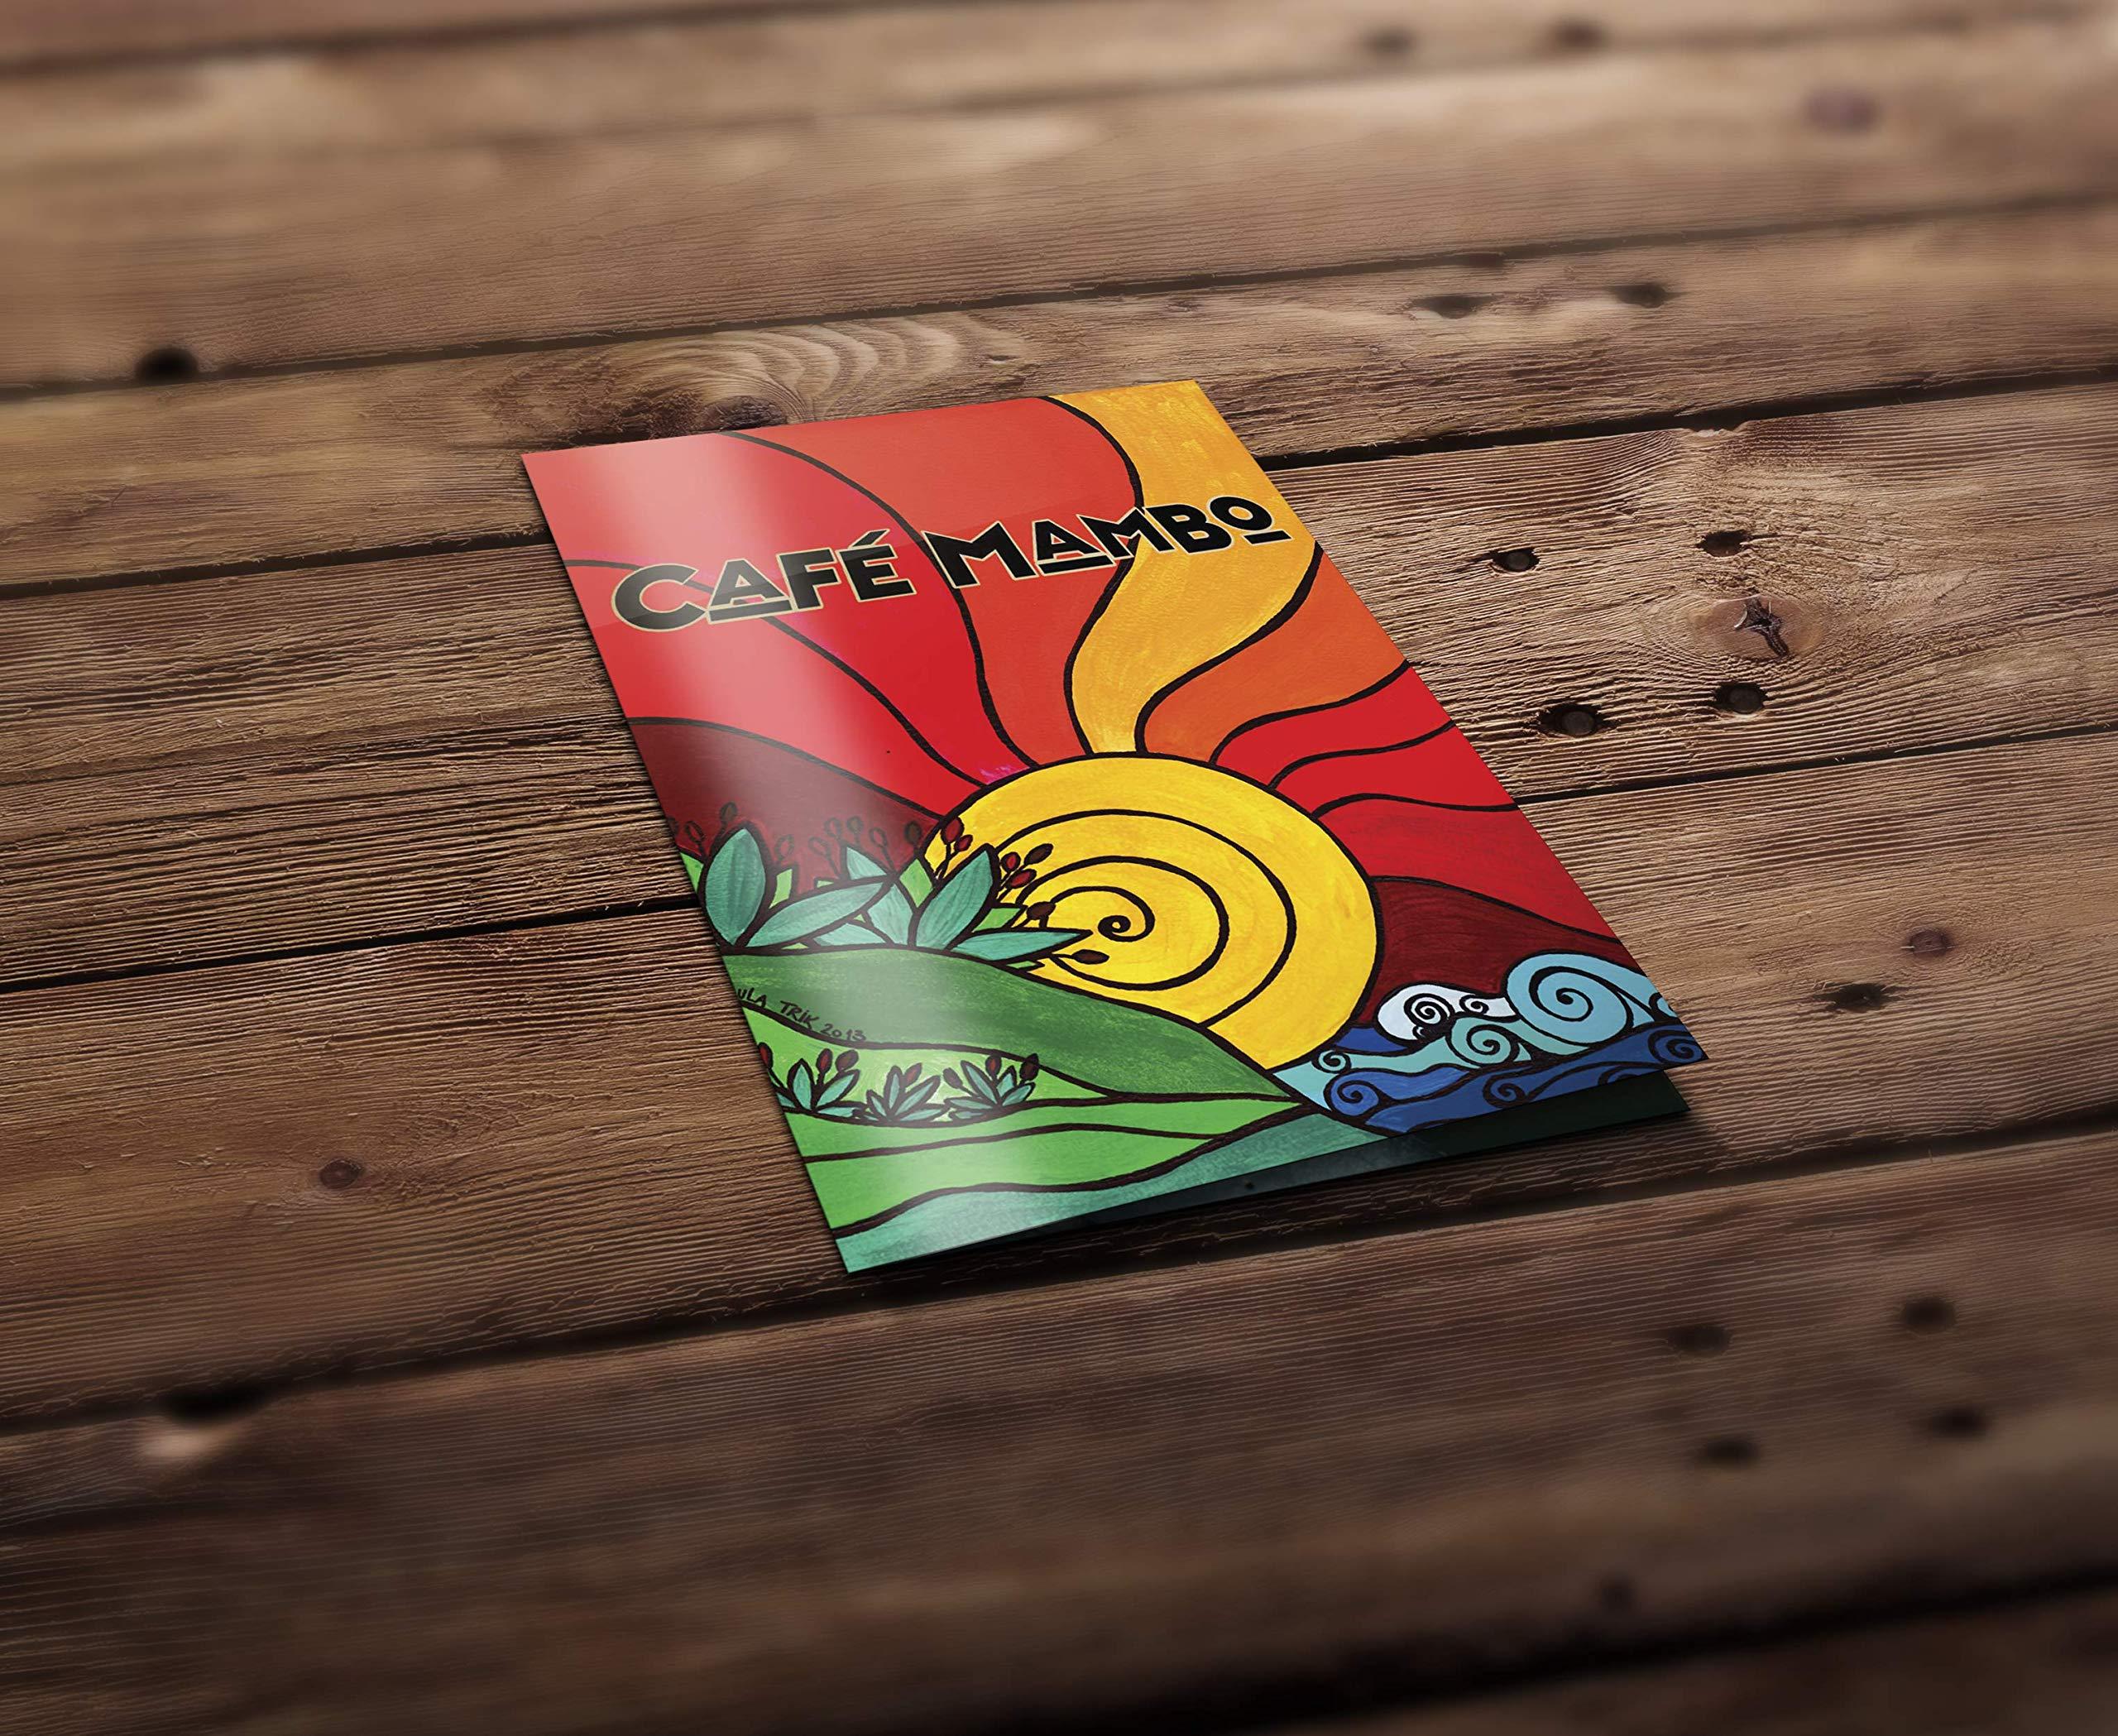 TerraSlate Paper 10 MIL 8.5'' x 11'' Waterproof Laser Printer/Copy Paper 500 sheets by TerraSlate Paper (Image #8)